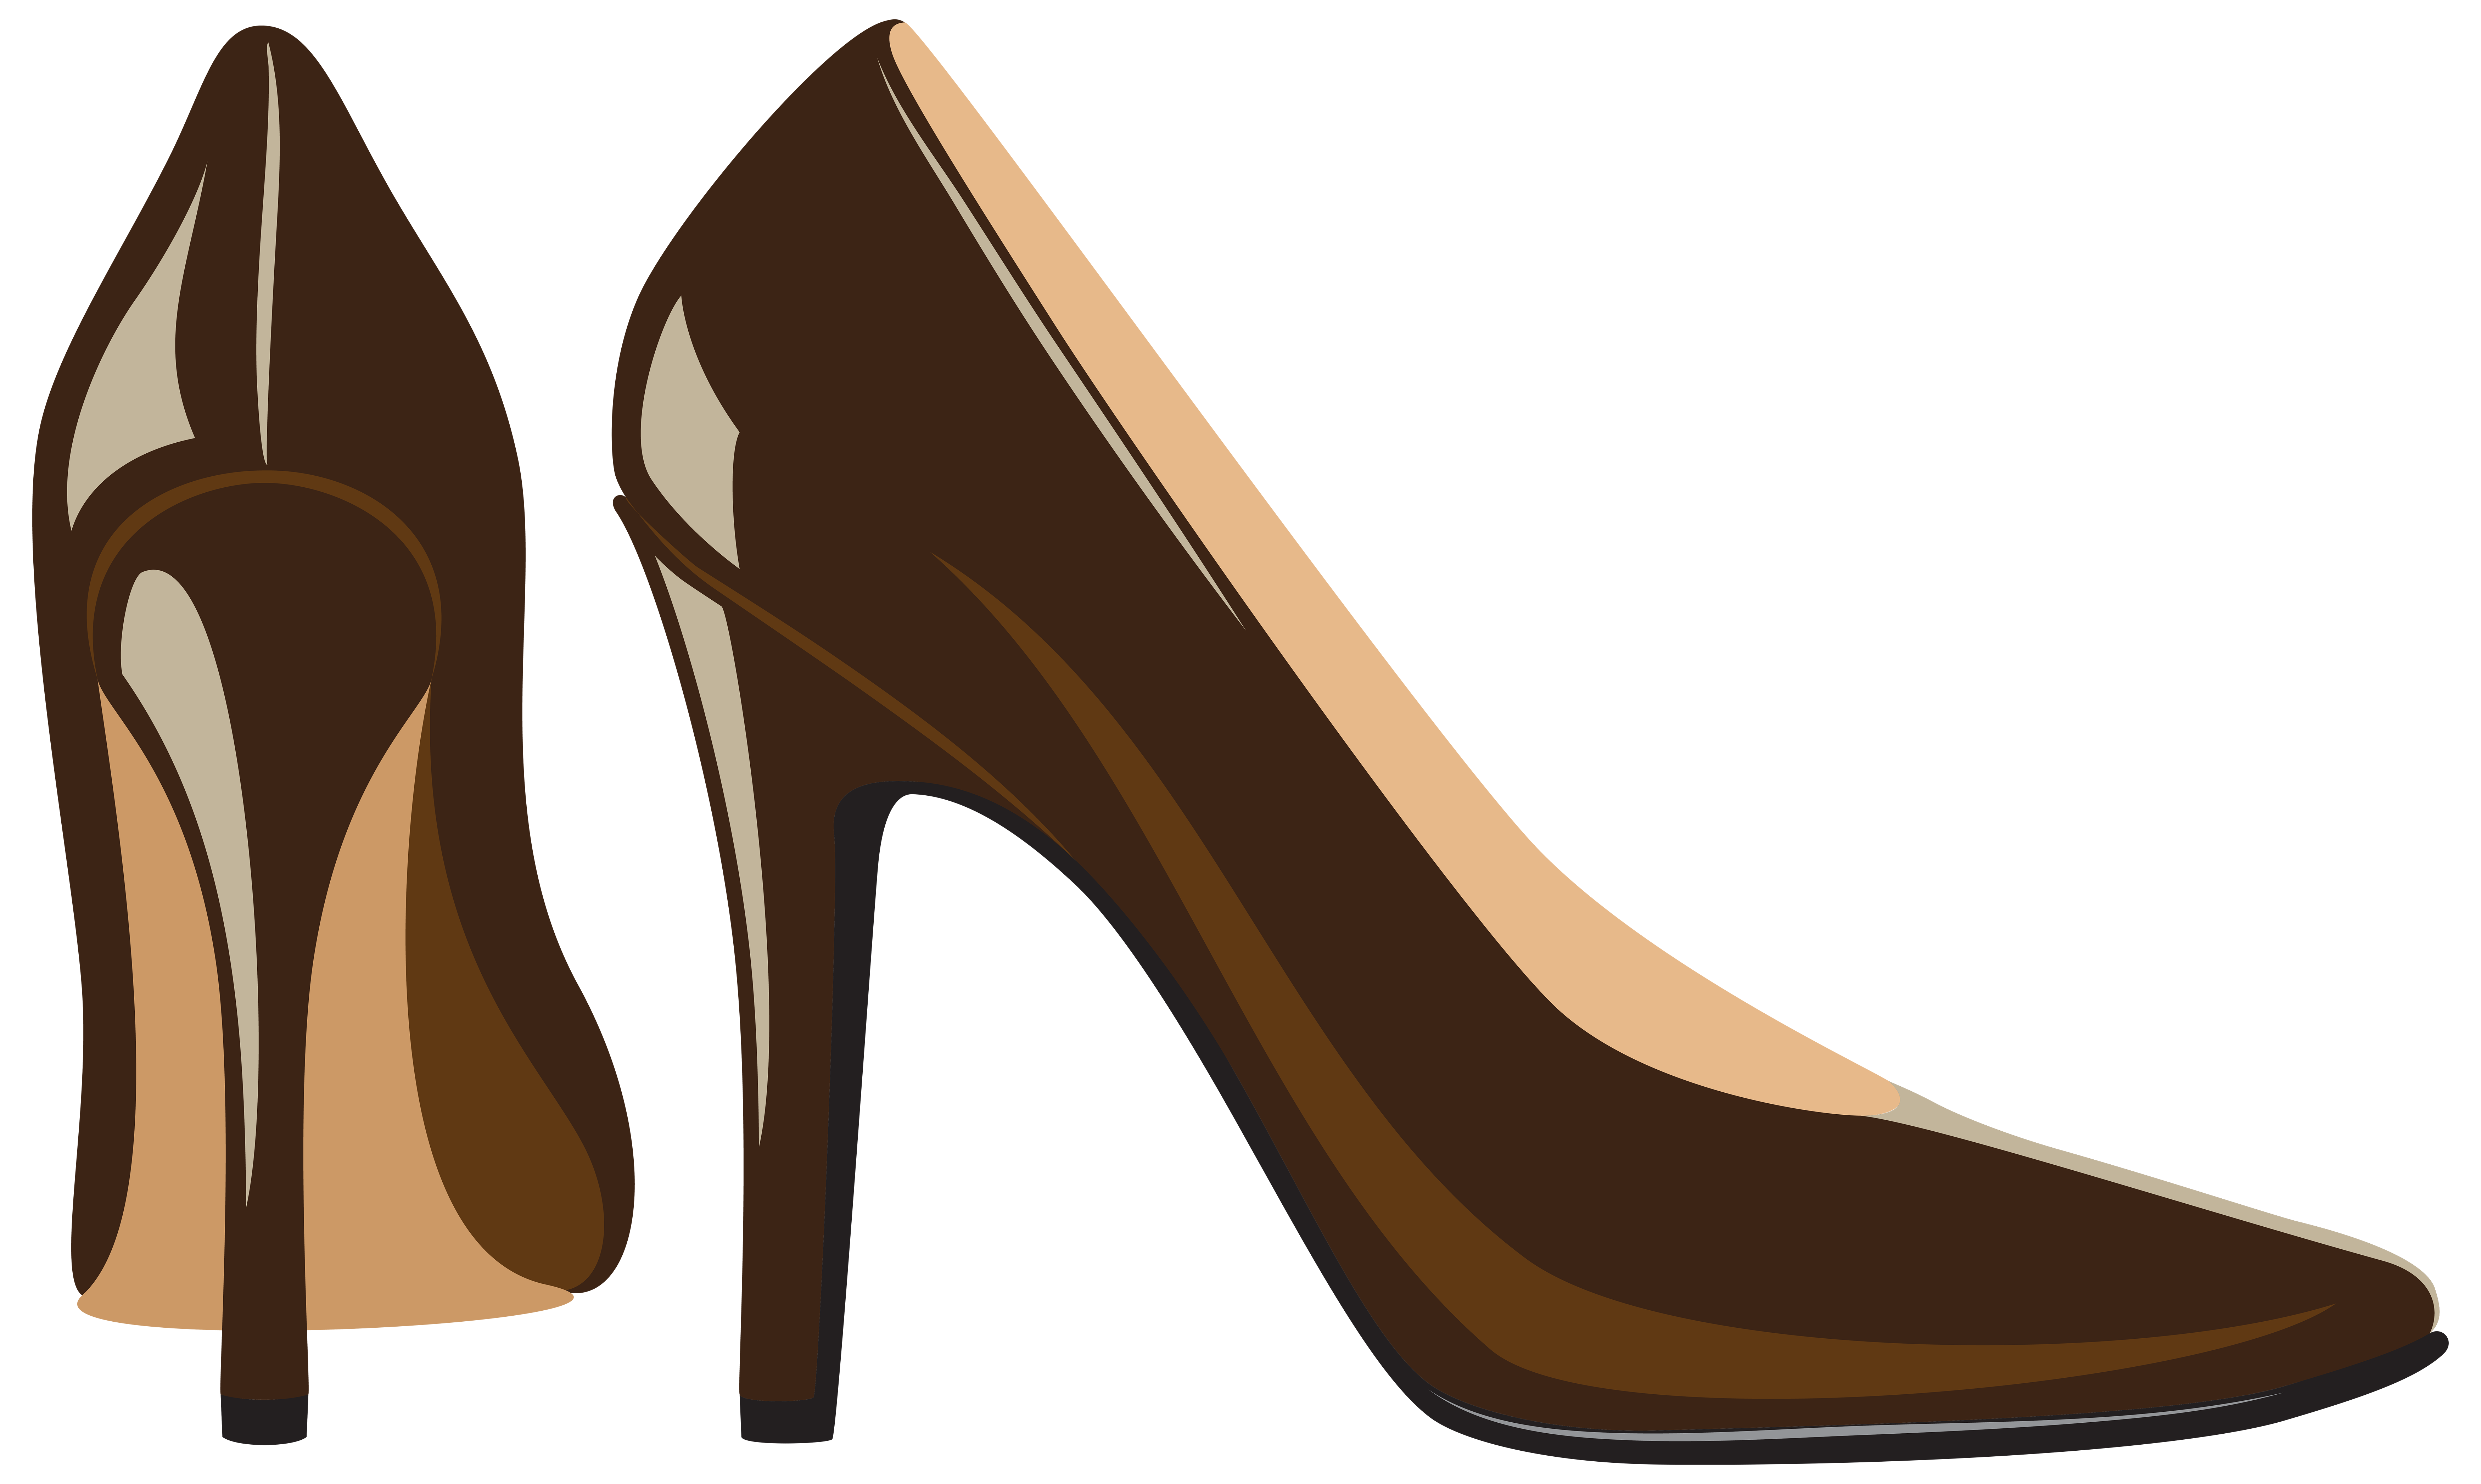 Brown heels png clip. Glass clipart shoe